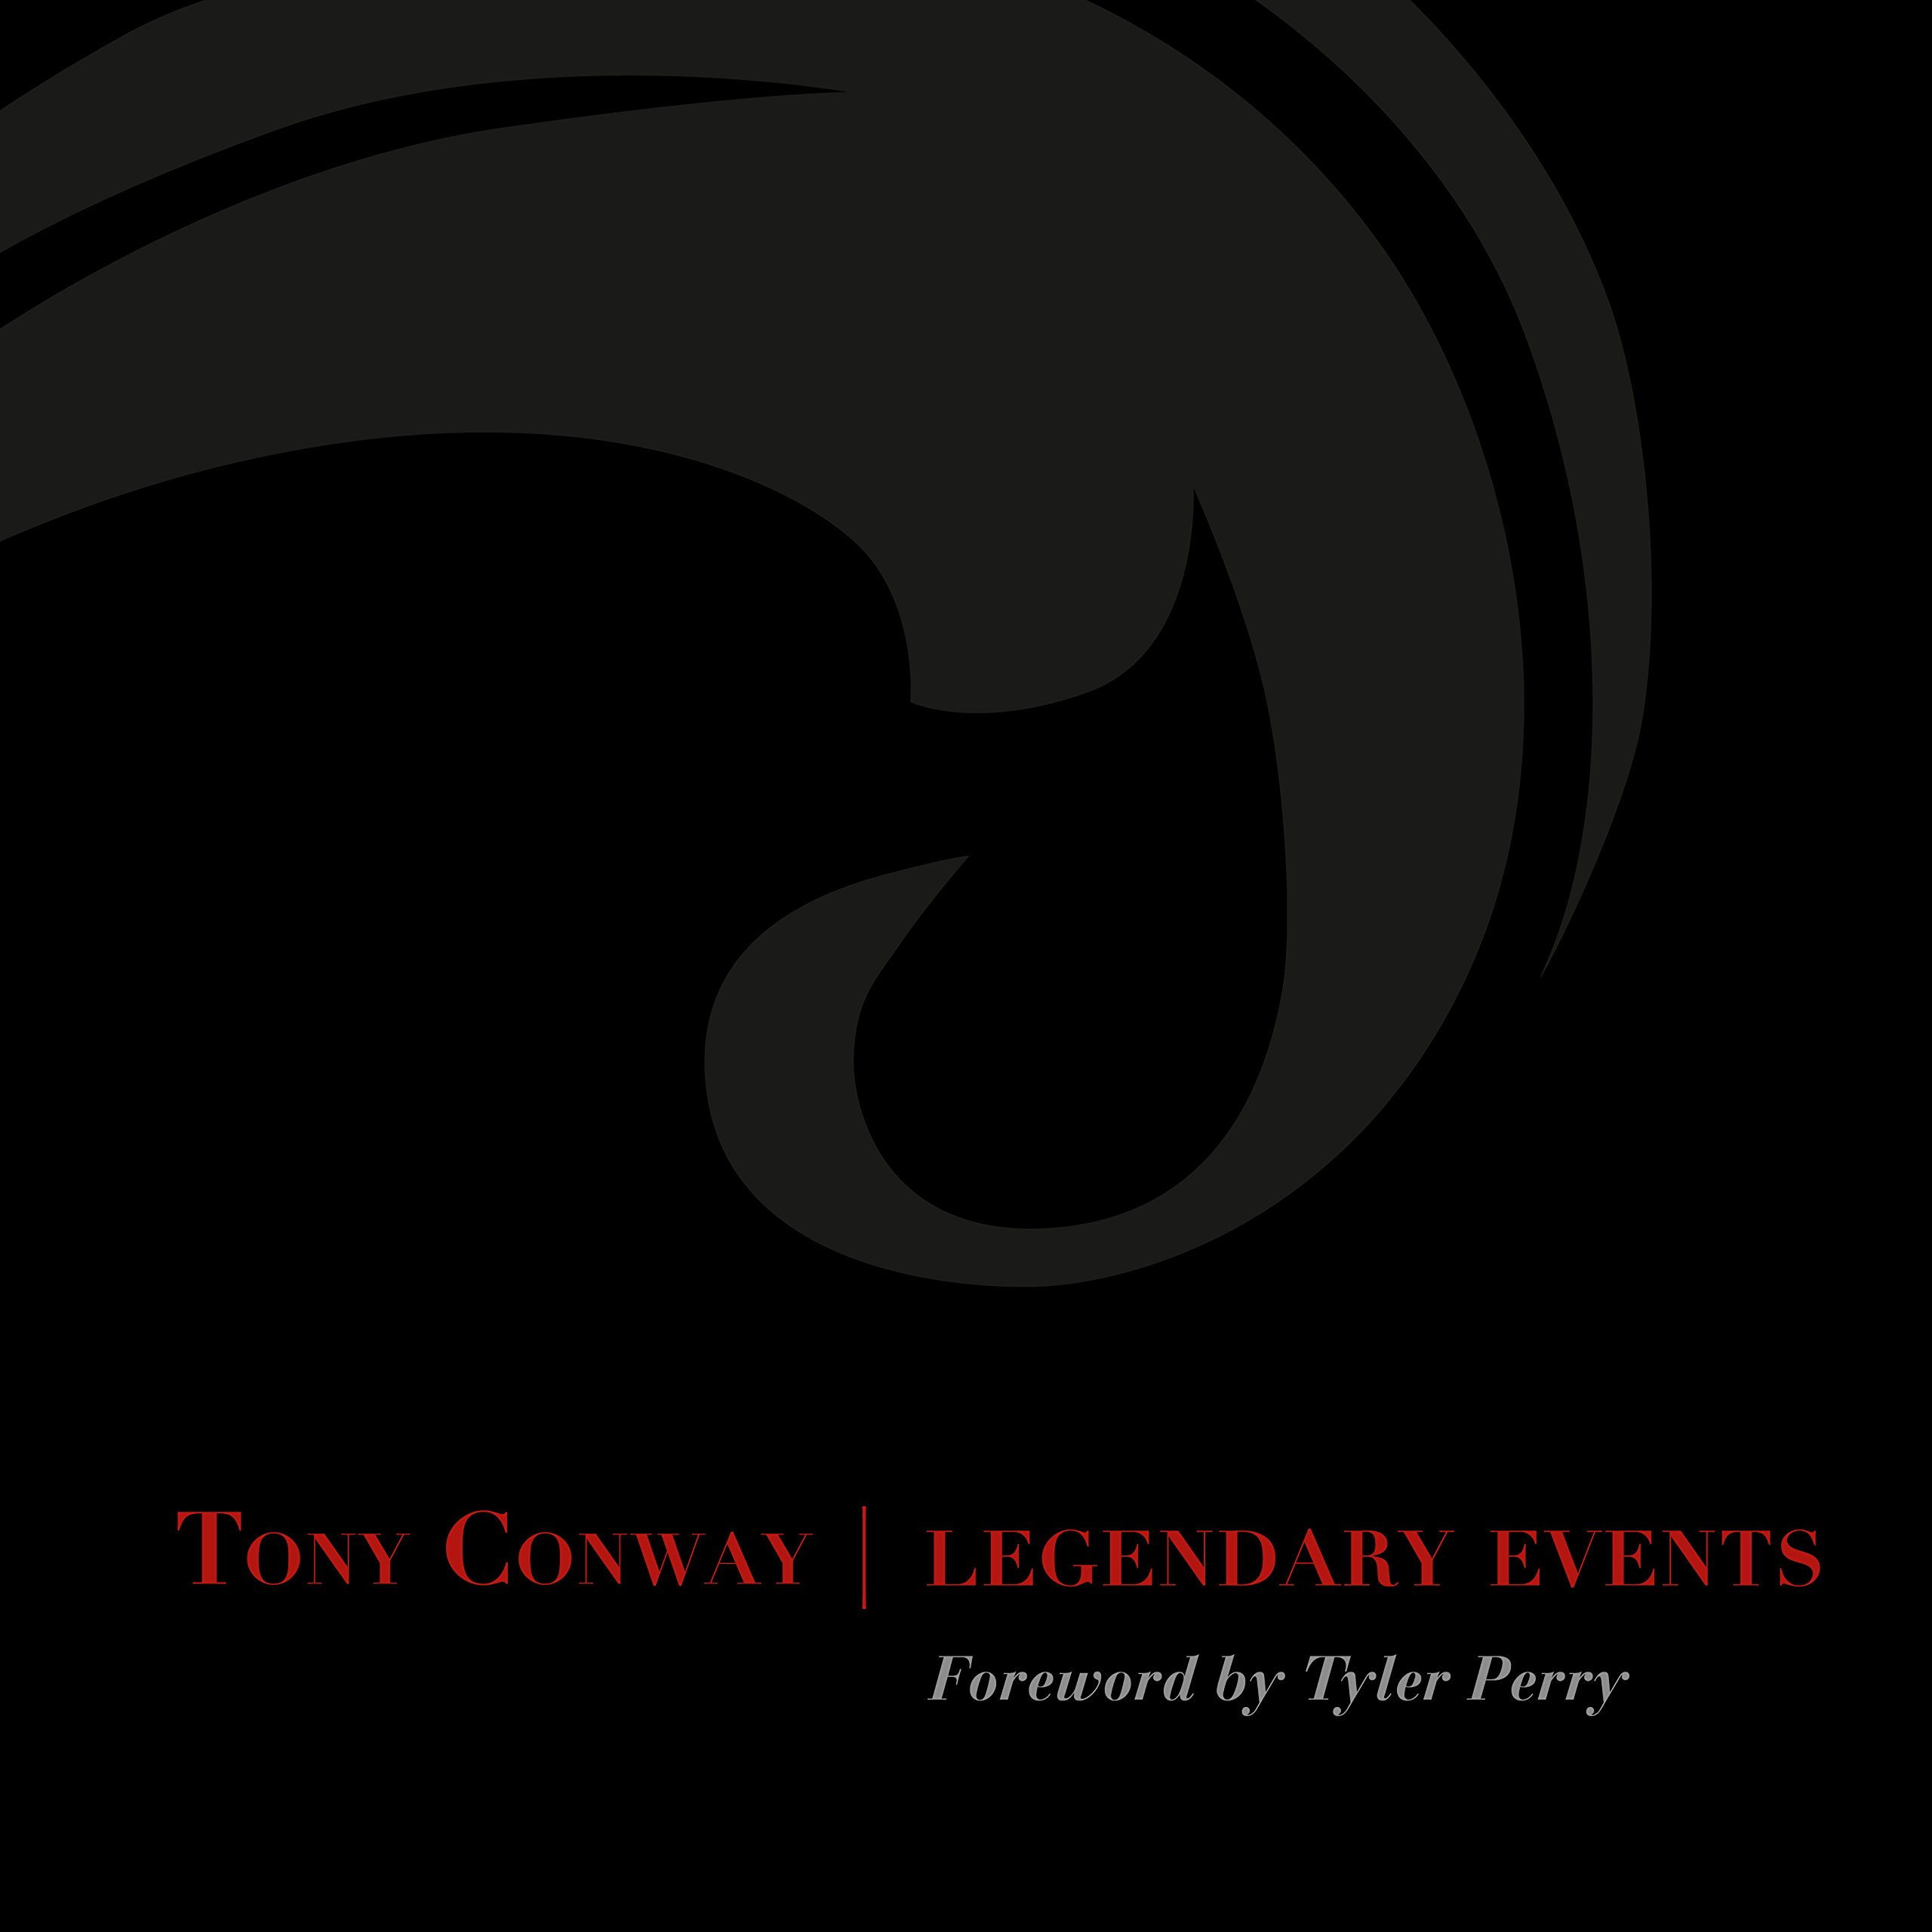 TONY CONWAY LEGENDARY EVENTS PDF